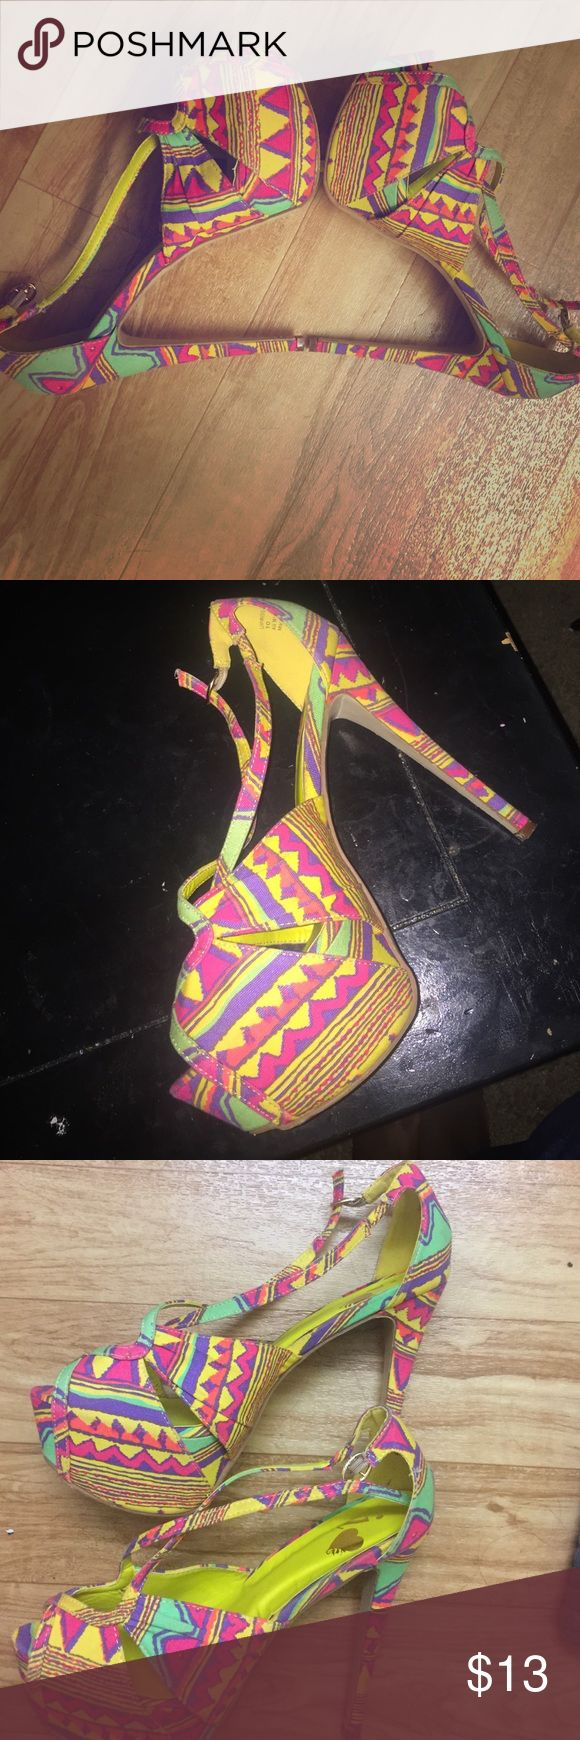 Multi coloured shoes ! High heels sandals Very fun hi fashion color heels Shoes Heels